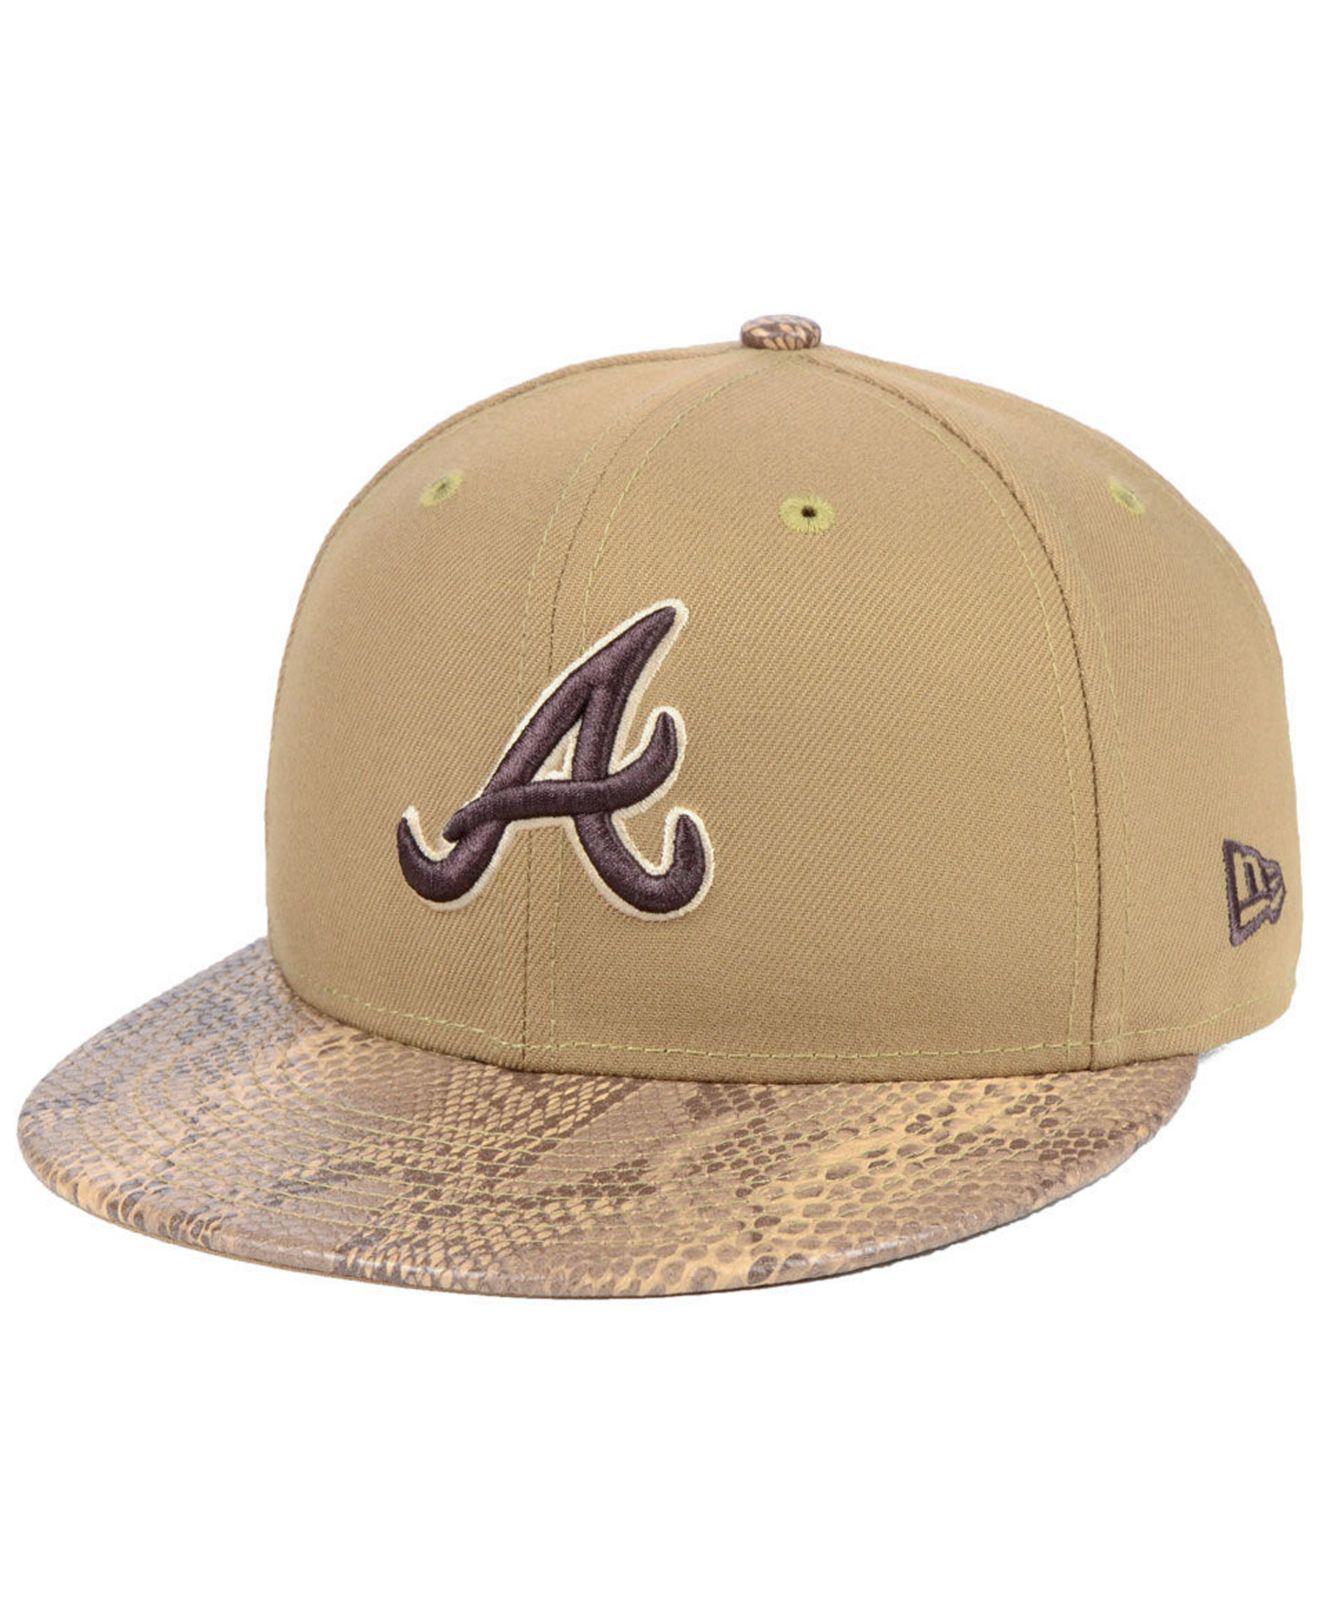 98951588629 Lyst - Ktz Atlanta Braves Snakeskin Sleek 59fifty Fitted Cap in ...